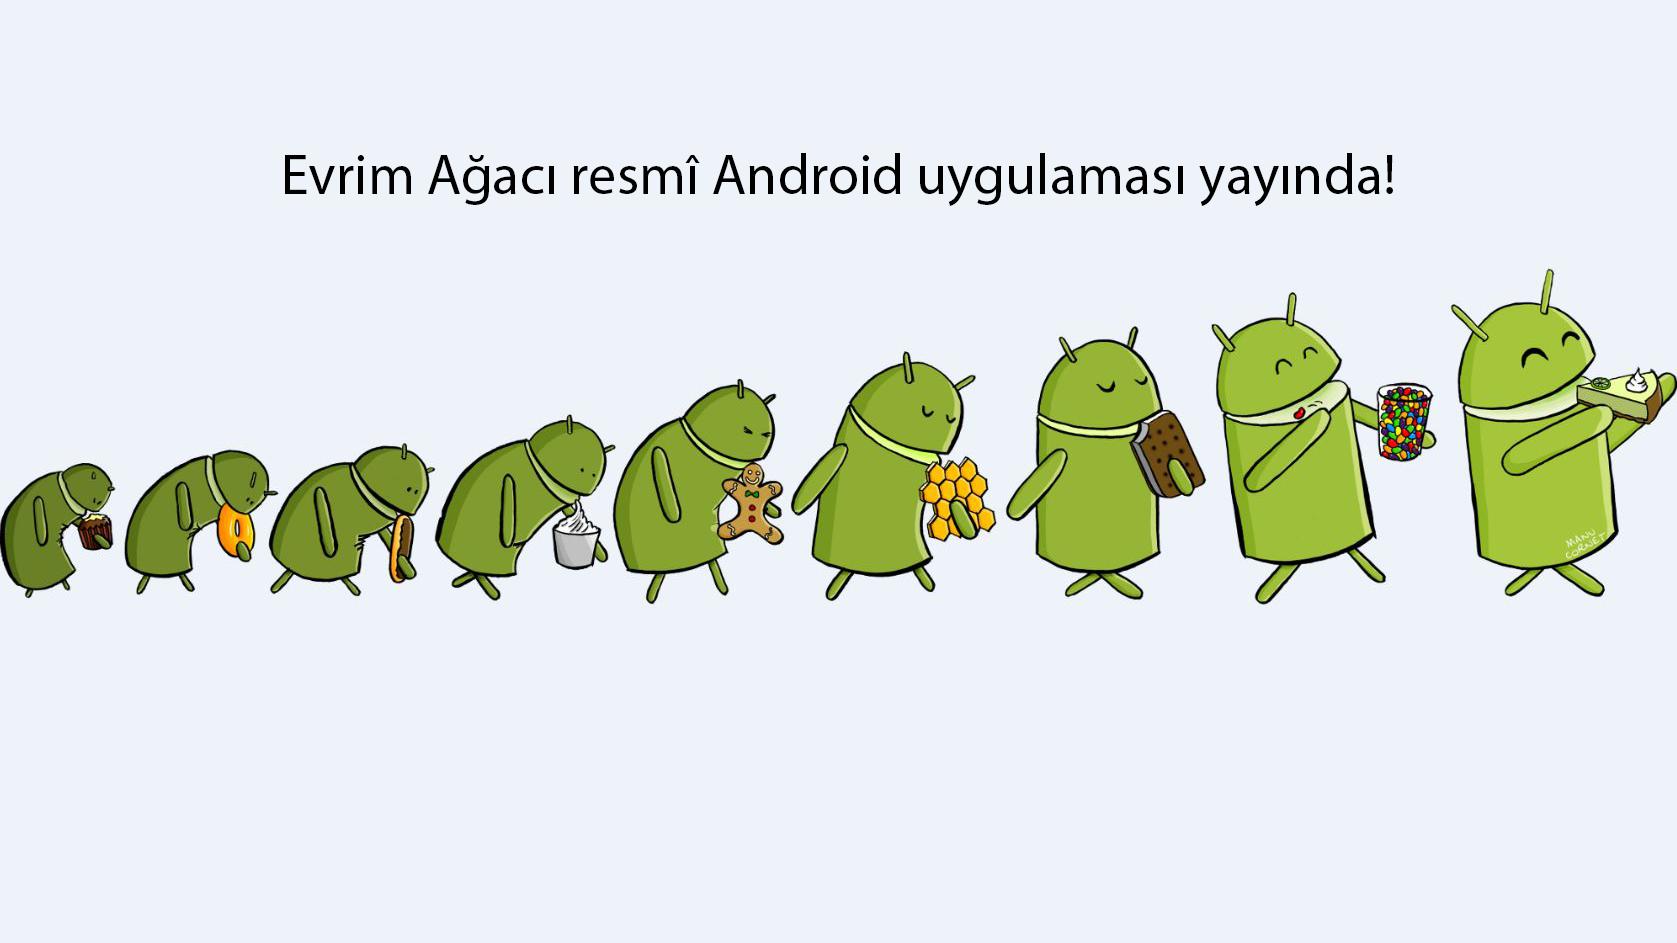 Android uygulamamız yayında!